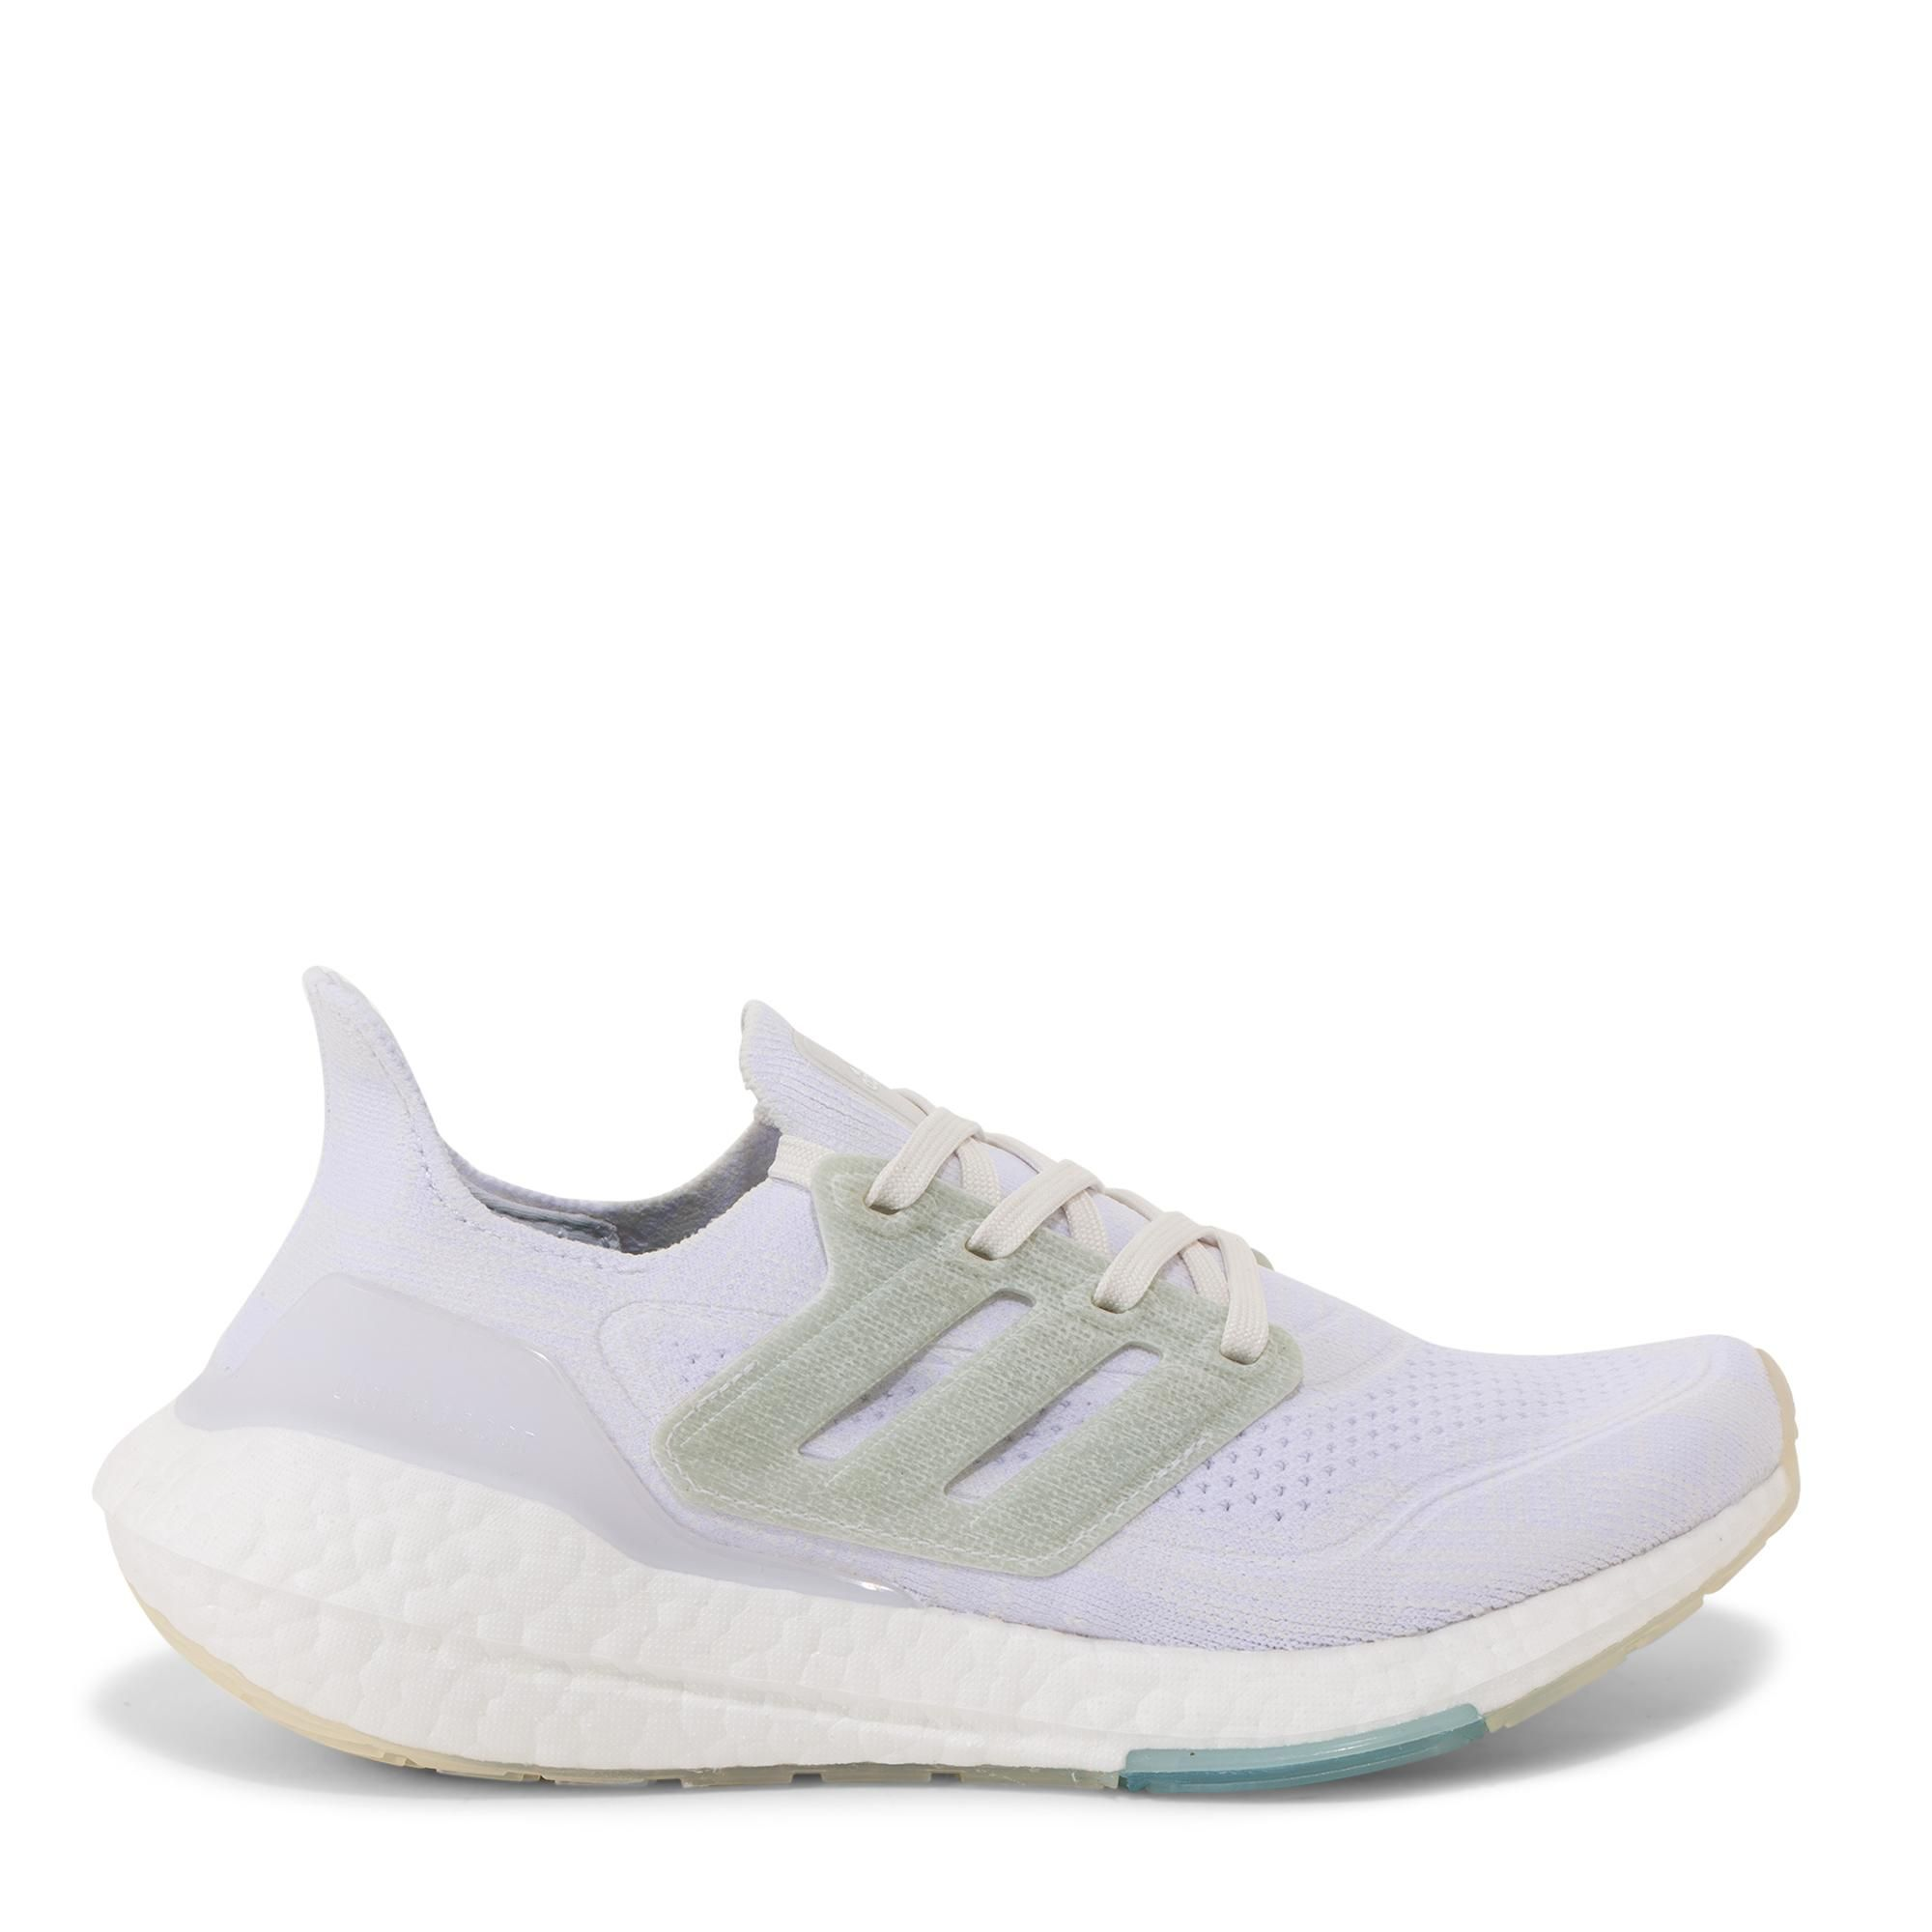 x Parley Ultraboost 21 sneakers